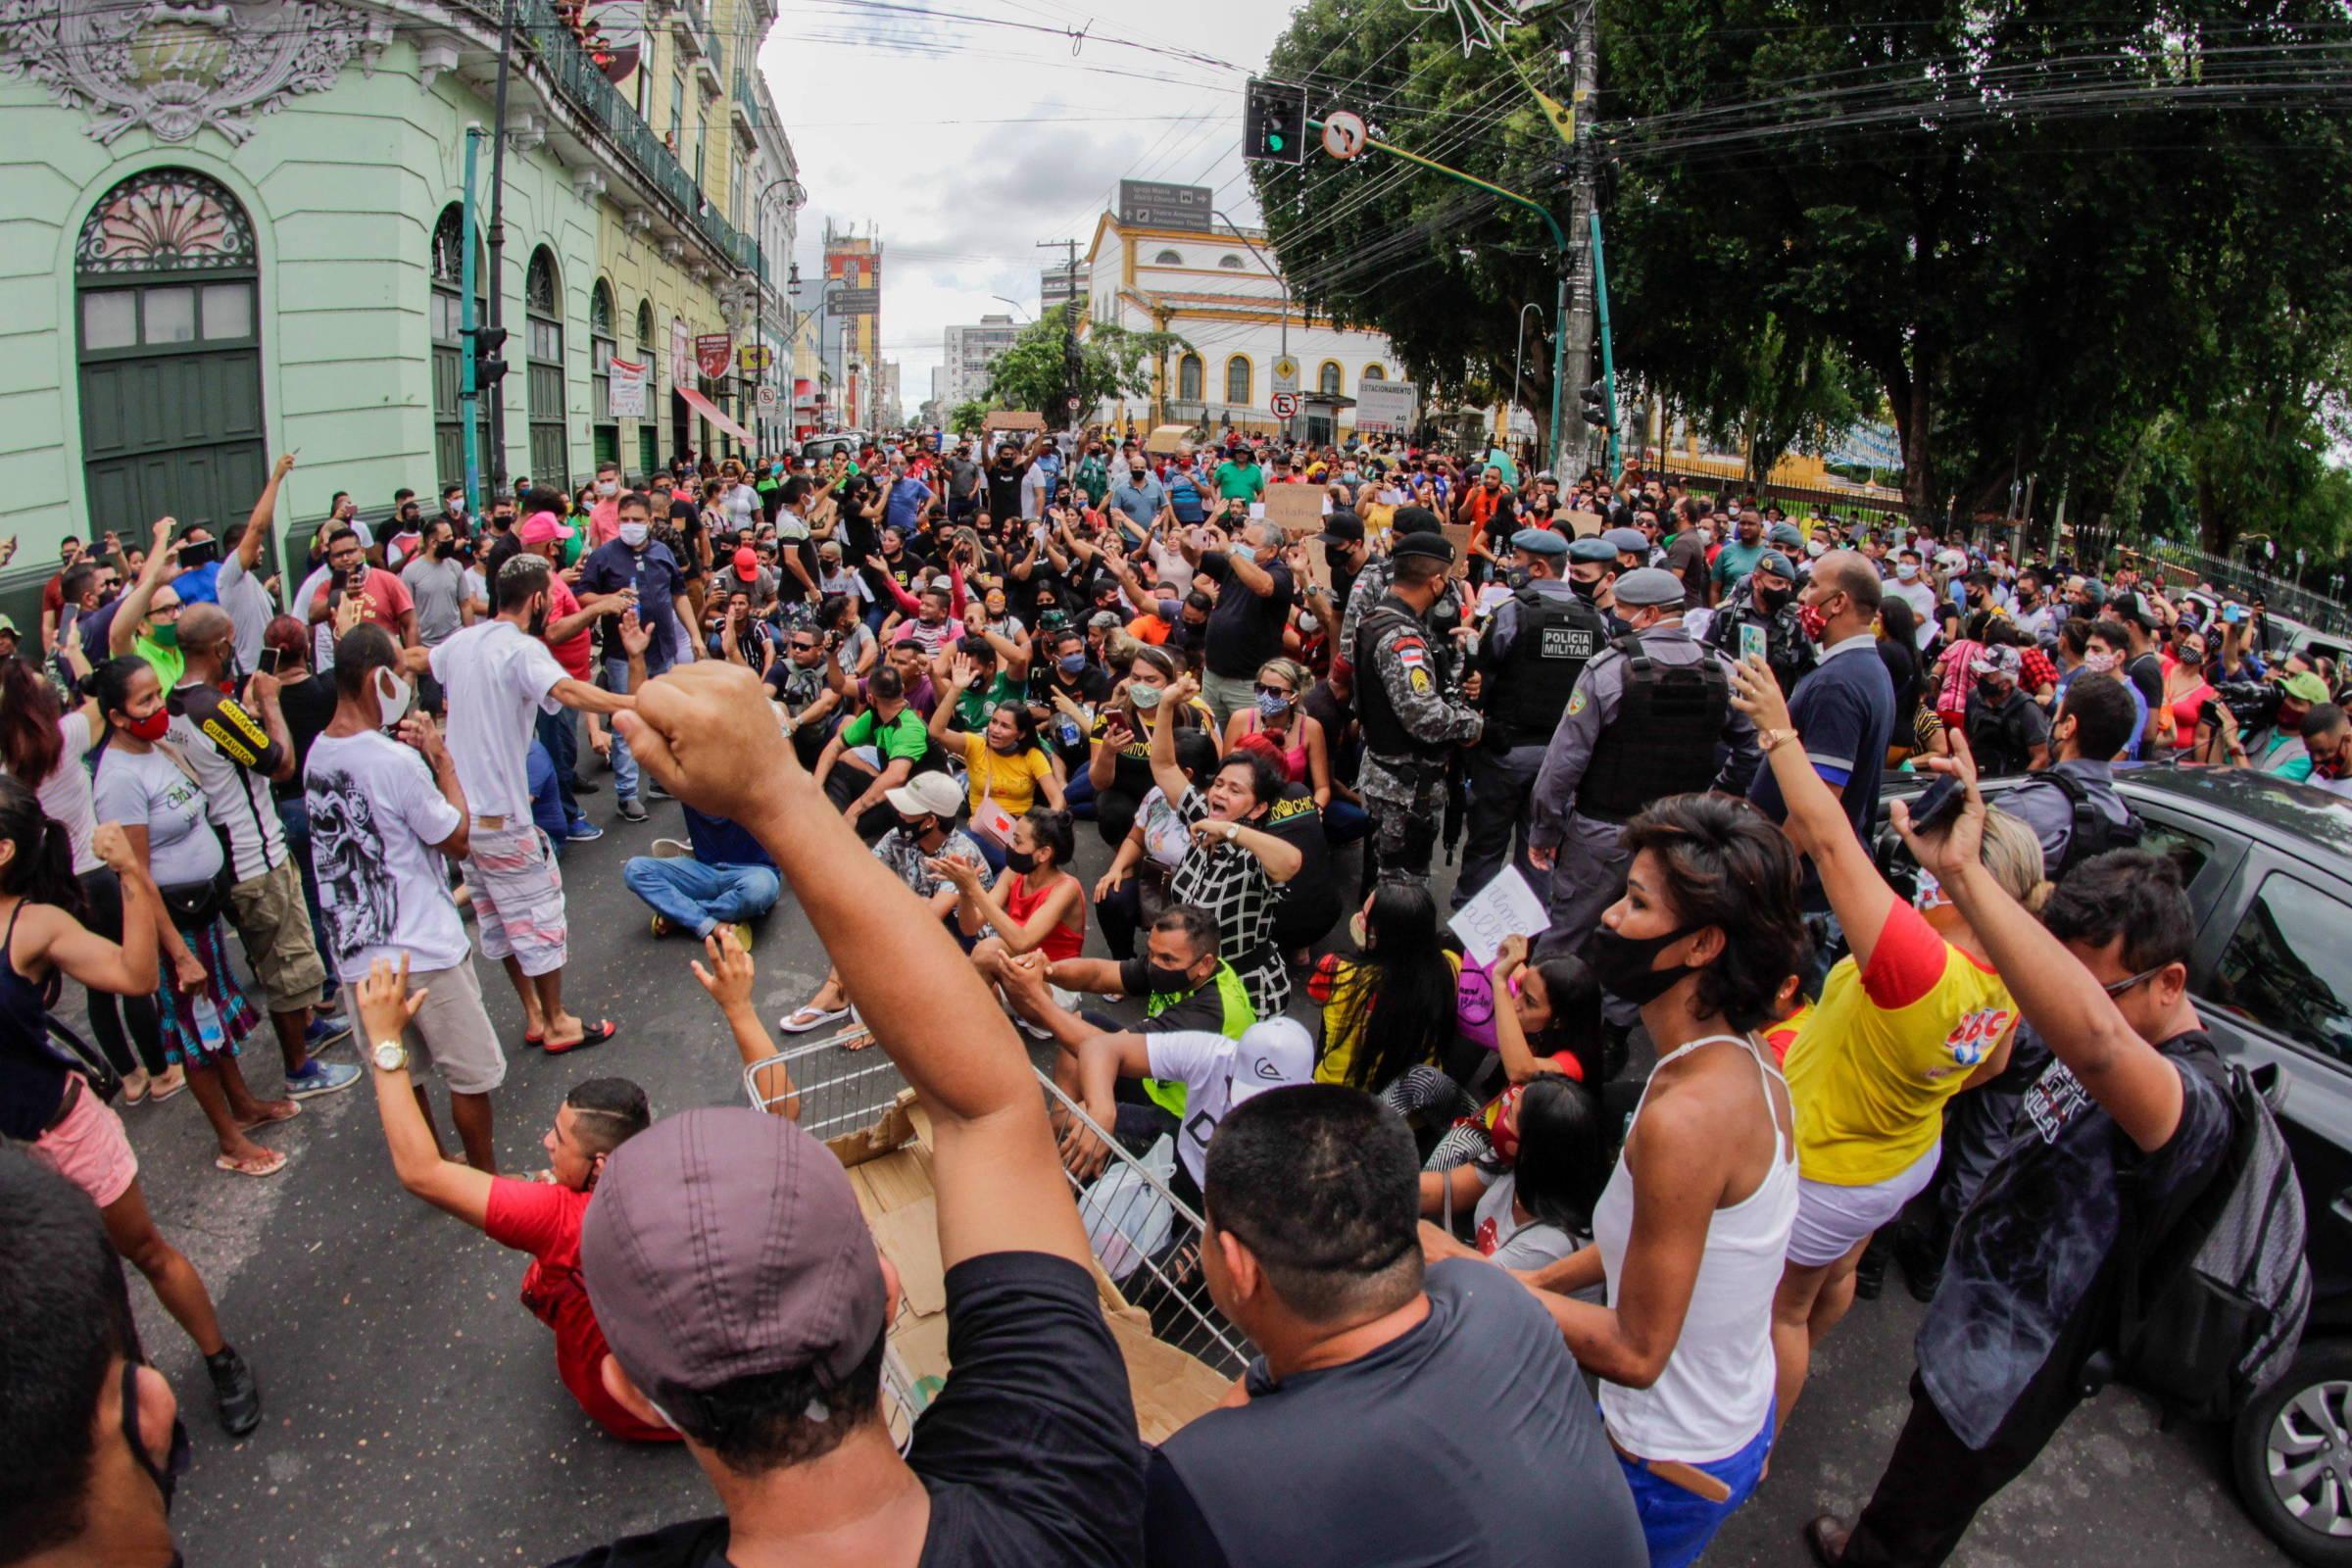 MBL realiza neste domingo protesto contra presidente Bolsonaro no centro de Manaus